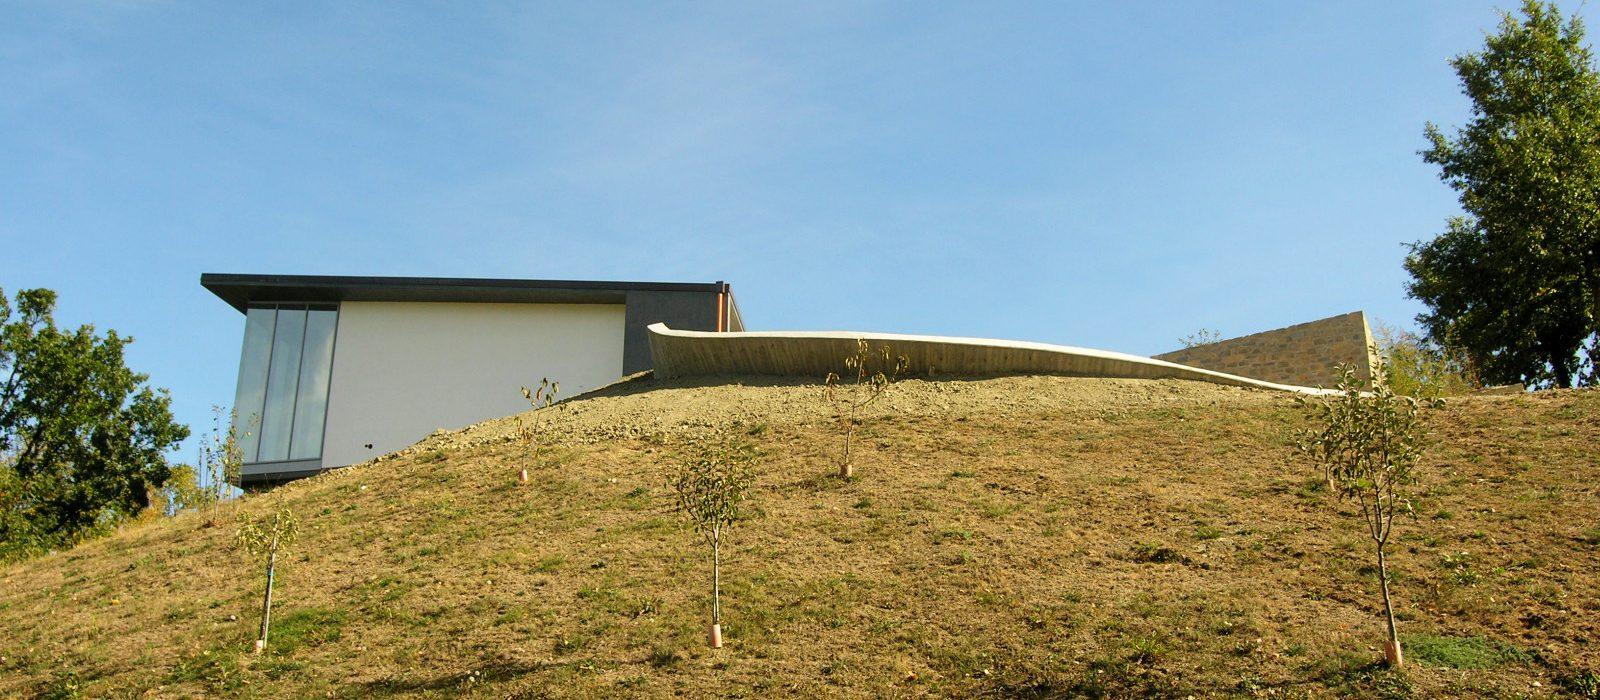 20_house_rita_progetto_studio_architettura_giuseppe_passaro